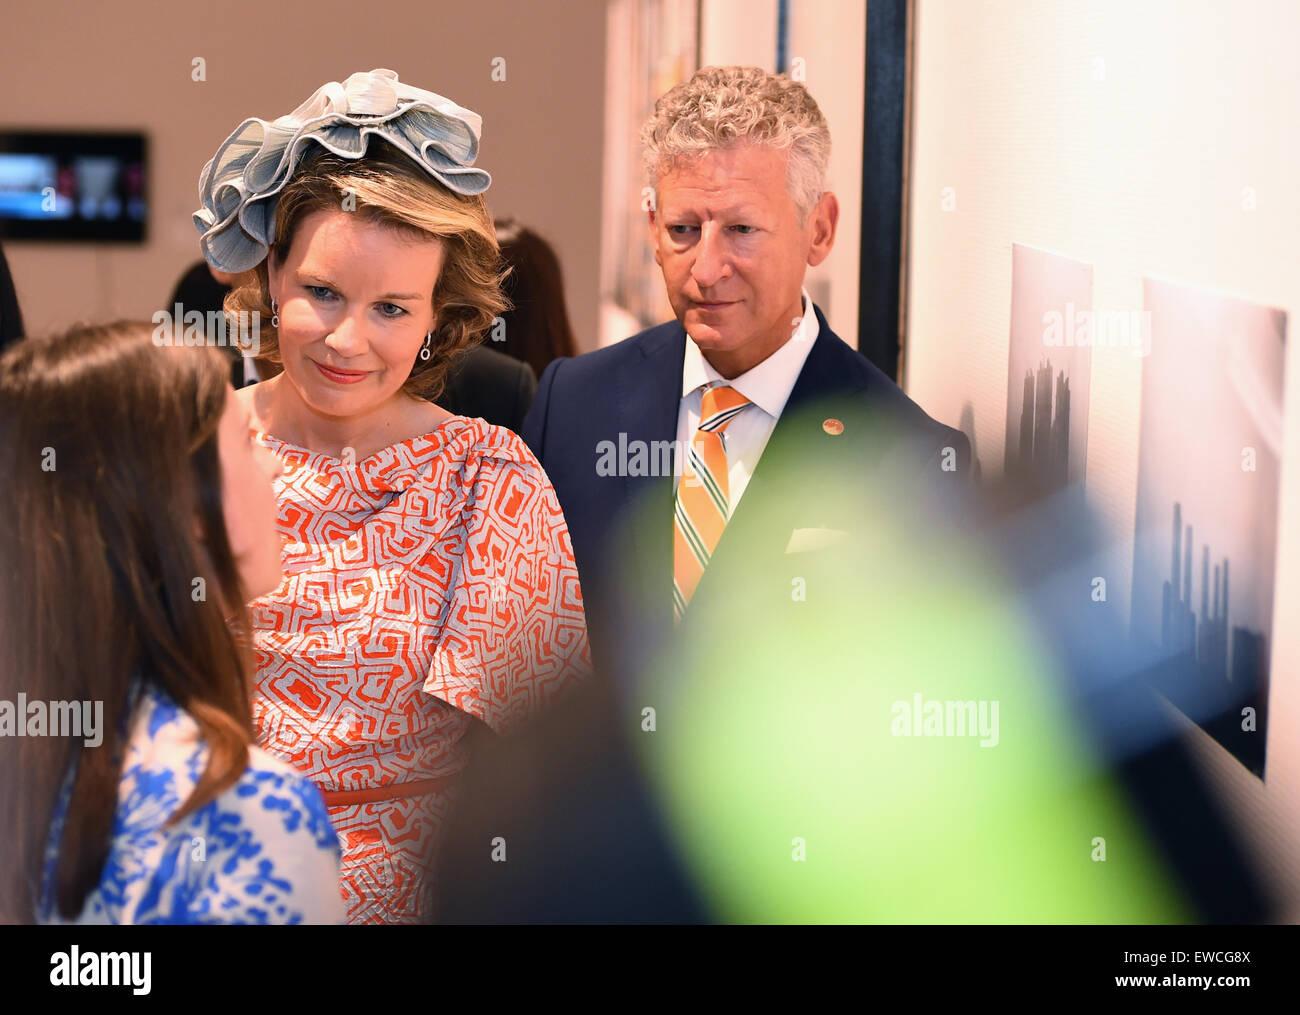 Wuhan, Hubei, China. 22nd June, 2015. Queen Mathilde of the Belgians visits Hubei Museum of Art in Wuhan Hubei Province. - Stock Image